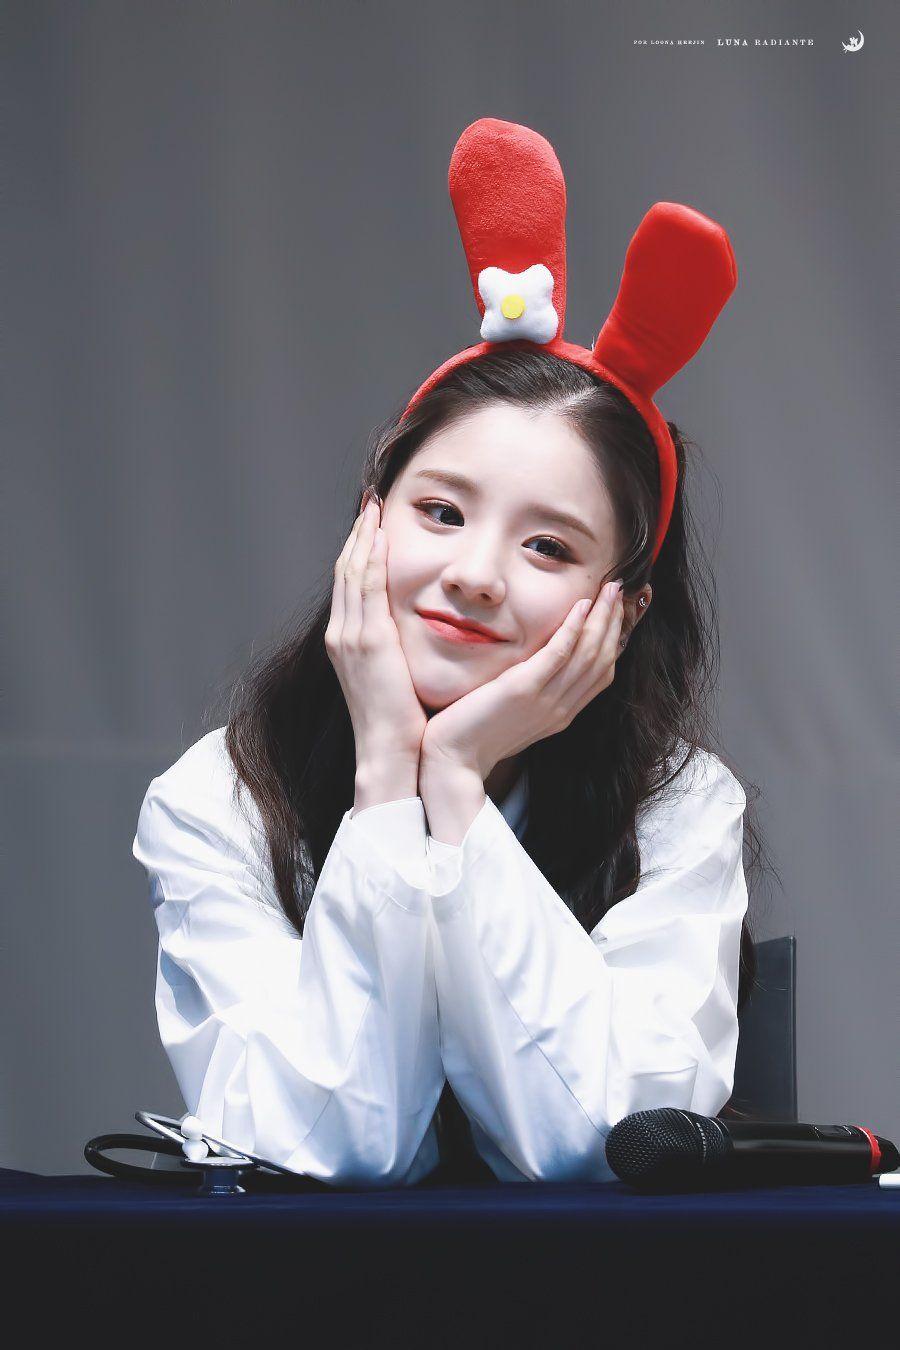 Heejin kpop kdrama bts exo kpoparmy jins